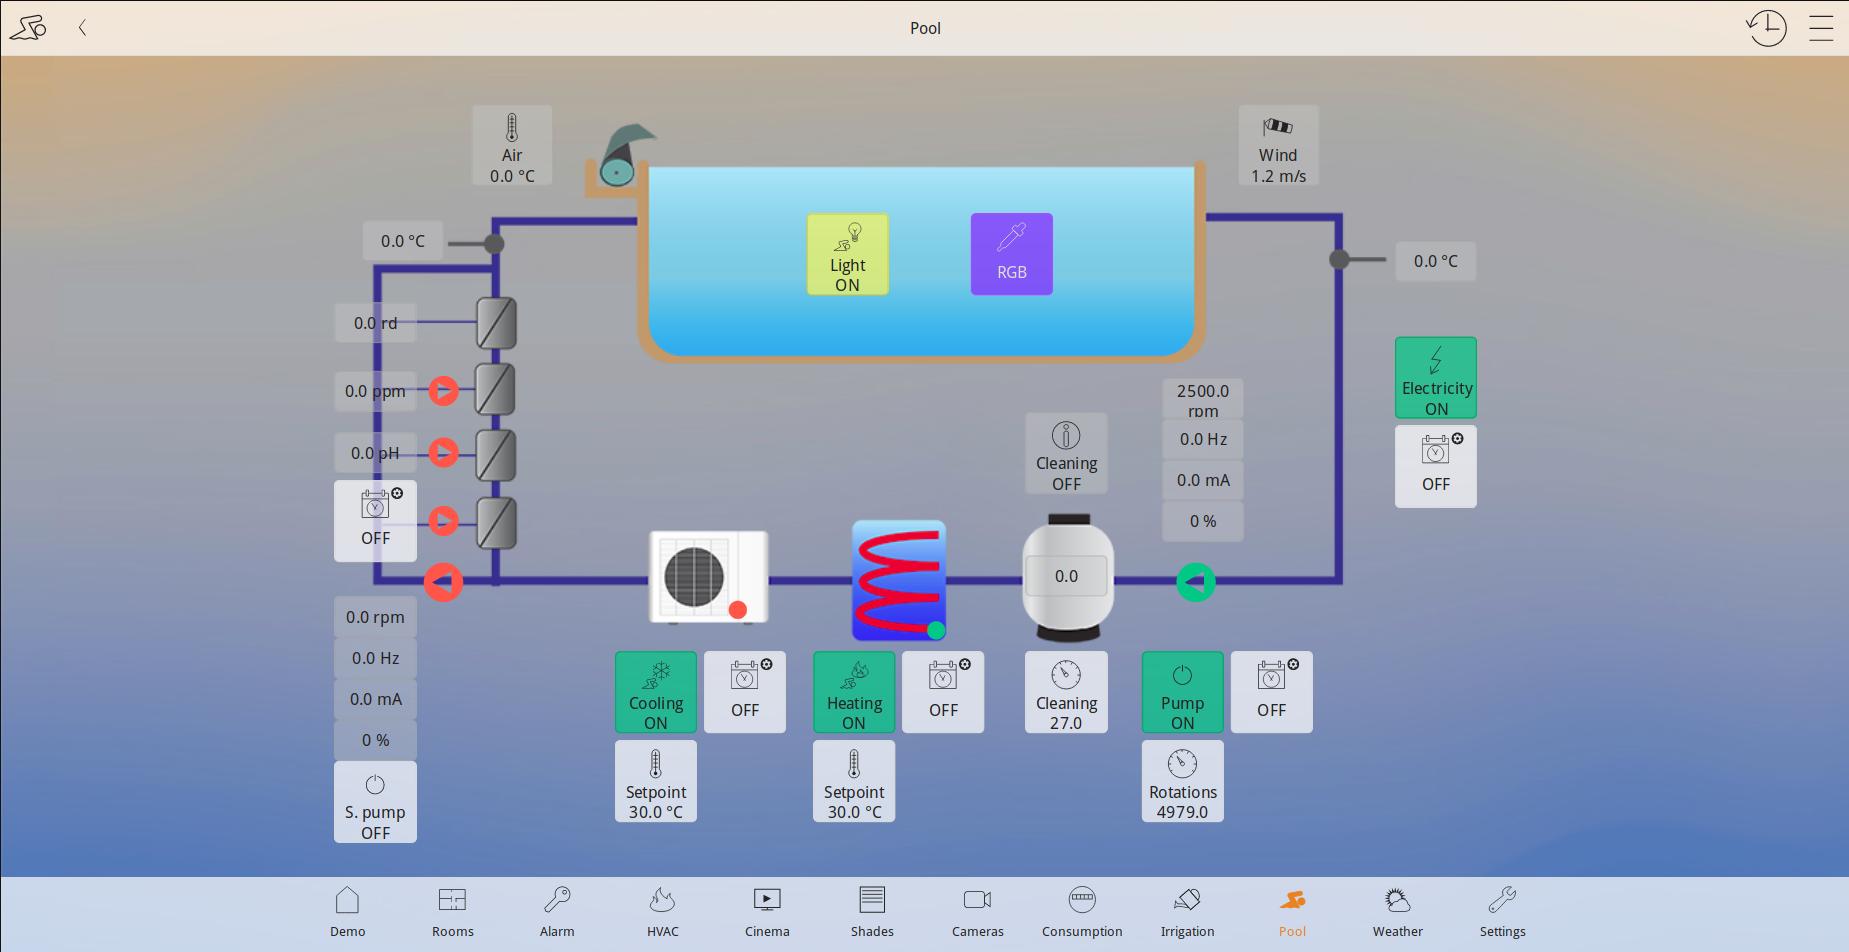 Smart home управление автоматизация на басейн